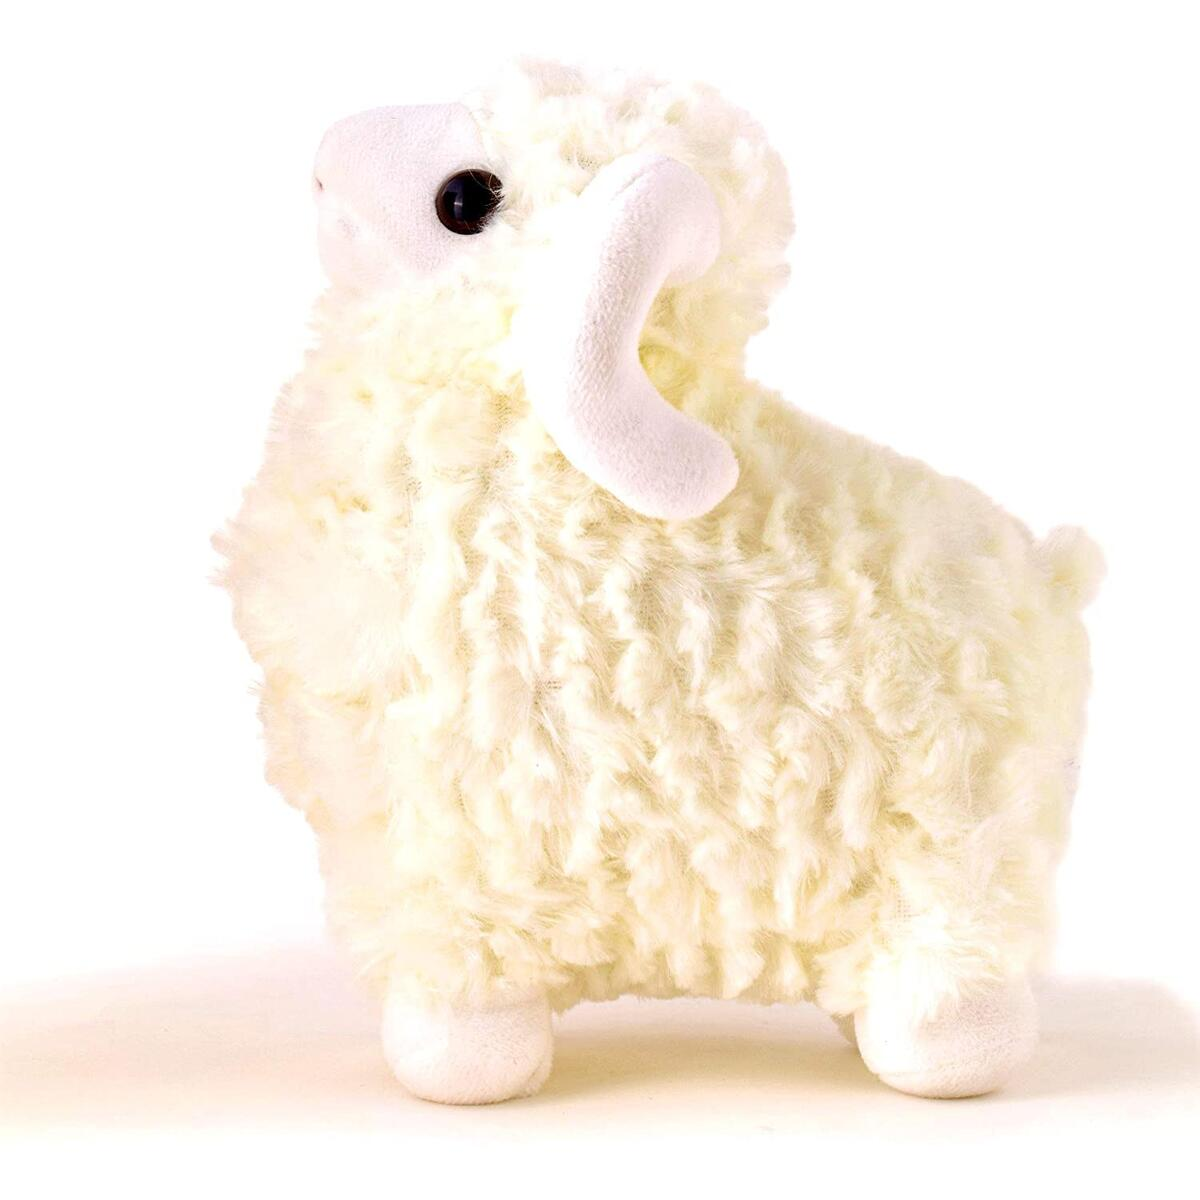 TorrisToys 10 Inches White Lamb Stuffed Animal - Perfect Cute Large Stuffed Sheep Plush - Great Plush Toy Sheep Gift